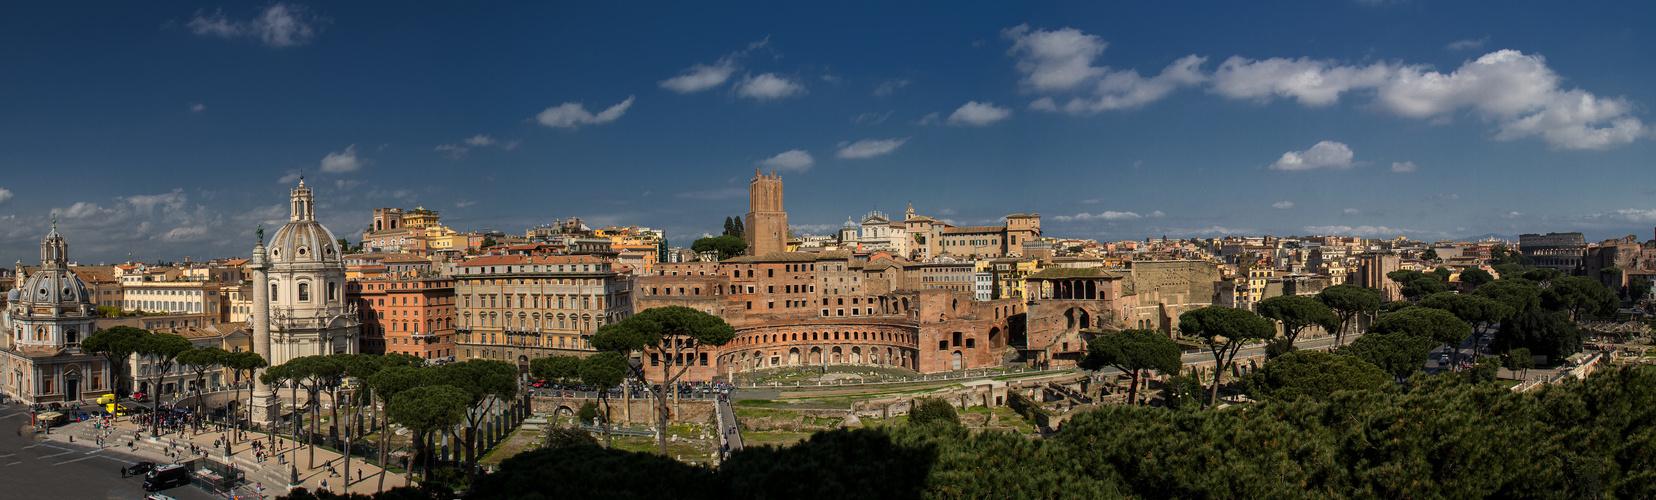 Vista dal Monumento Vittorio Emanuele II